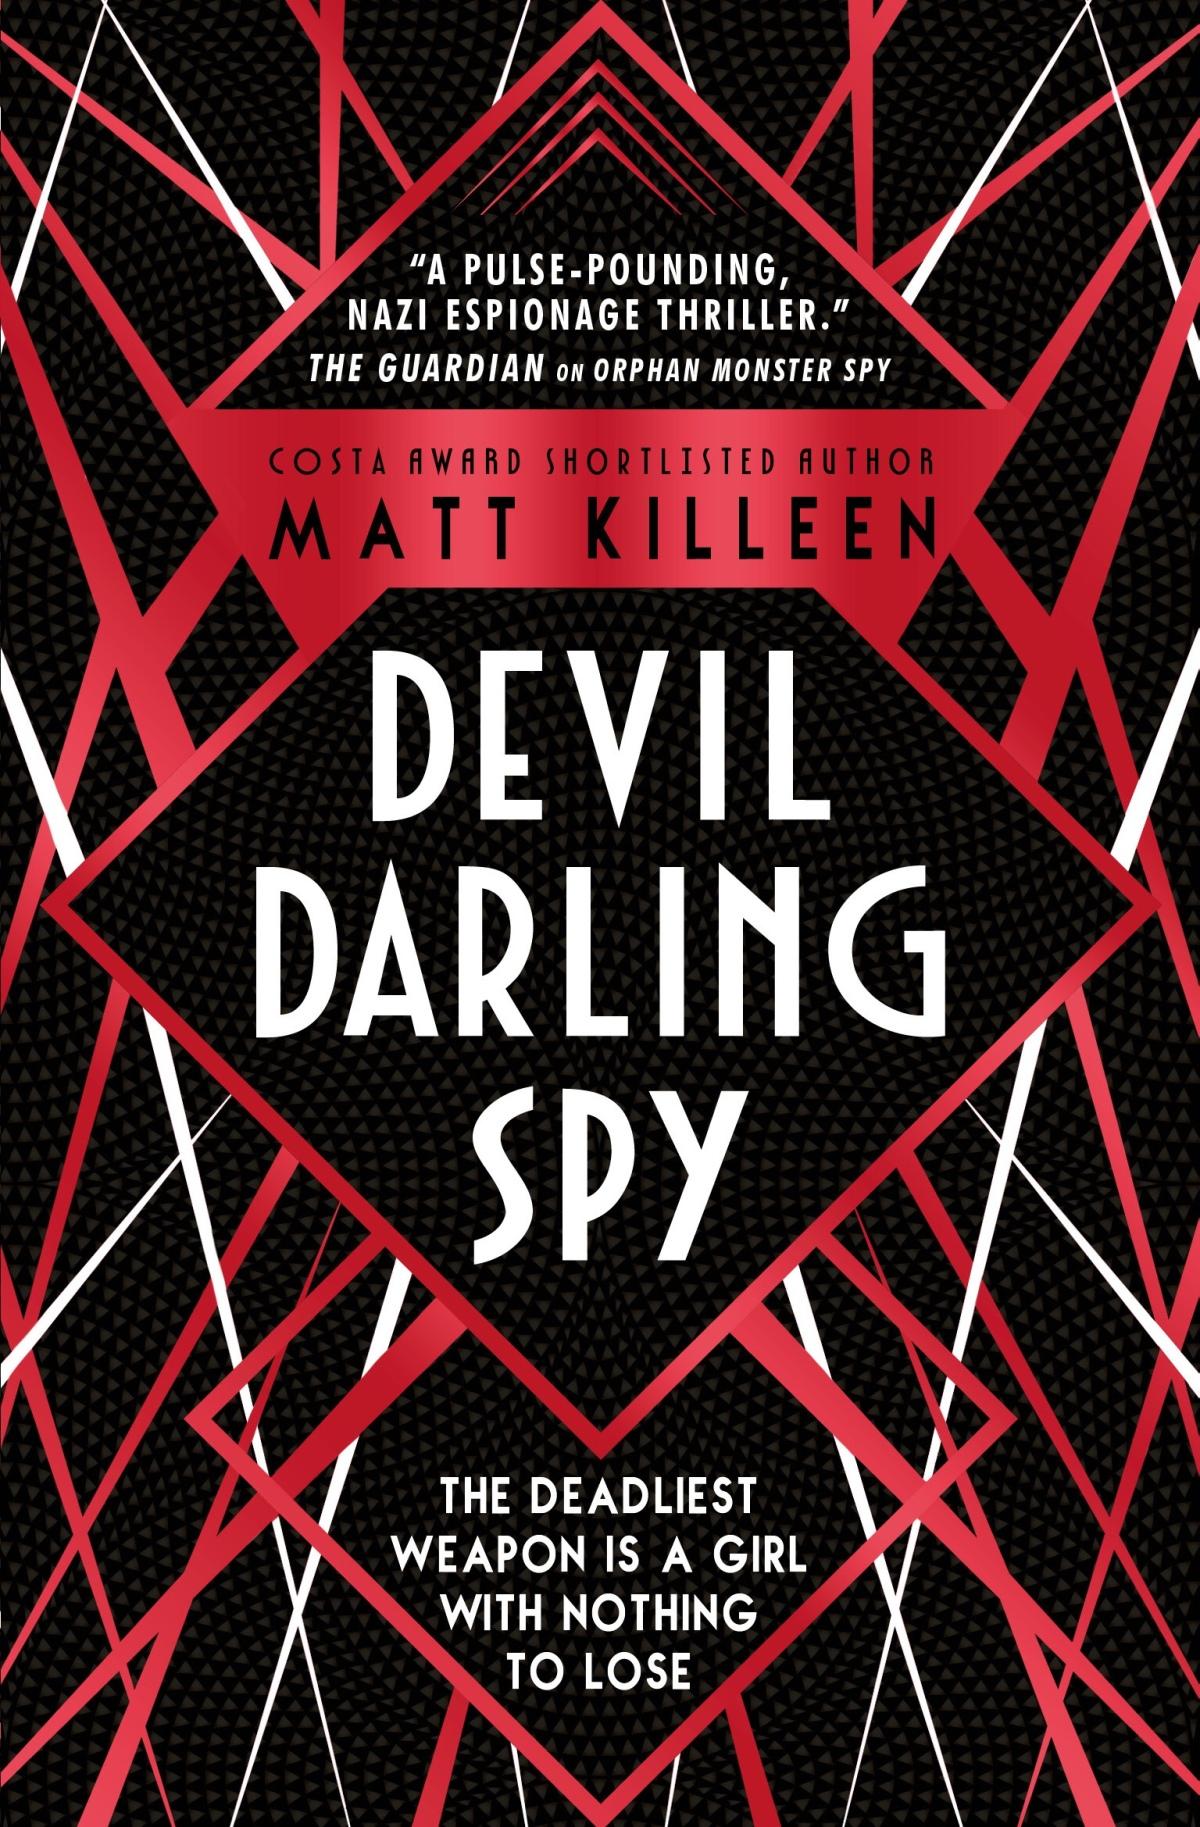 Blog Tour Review: Devil Darling Spy by MattKilleen